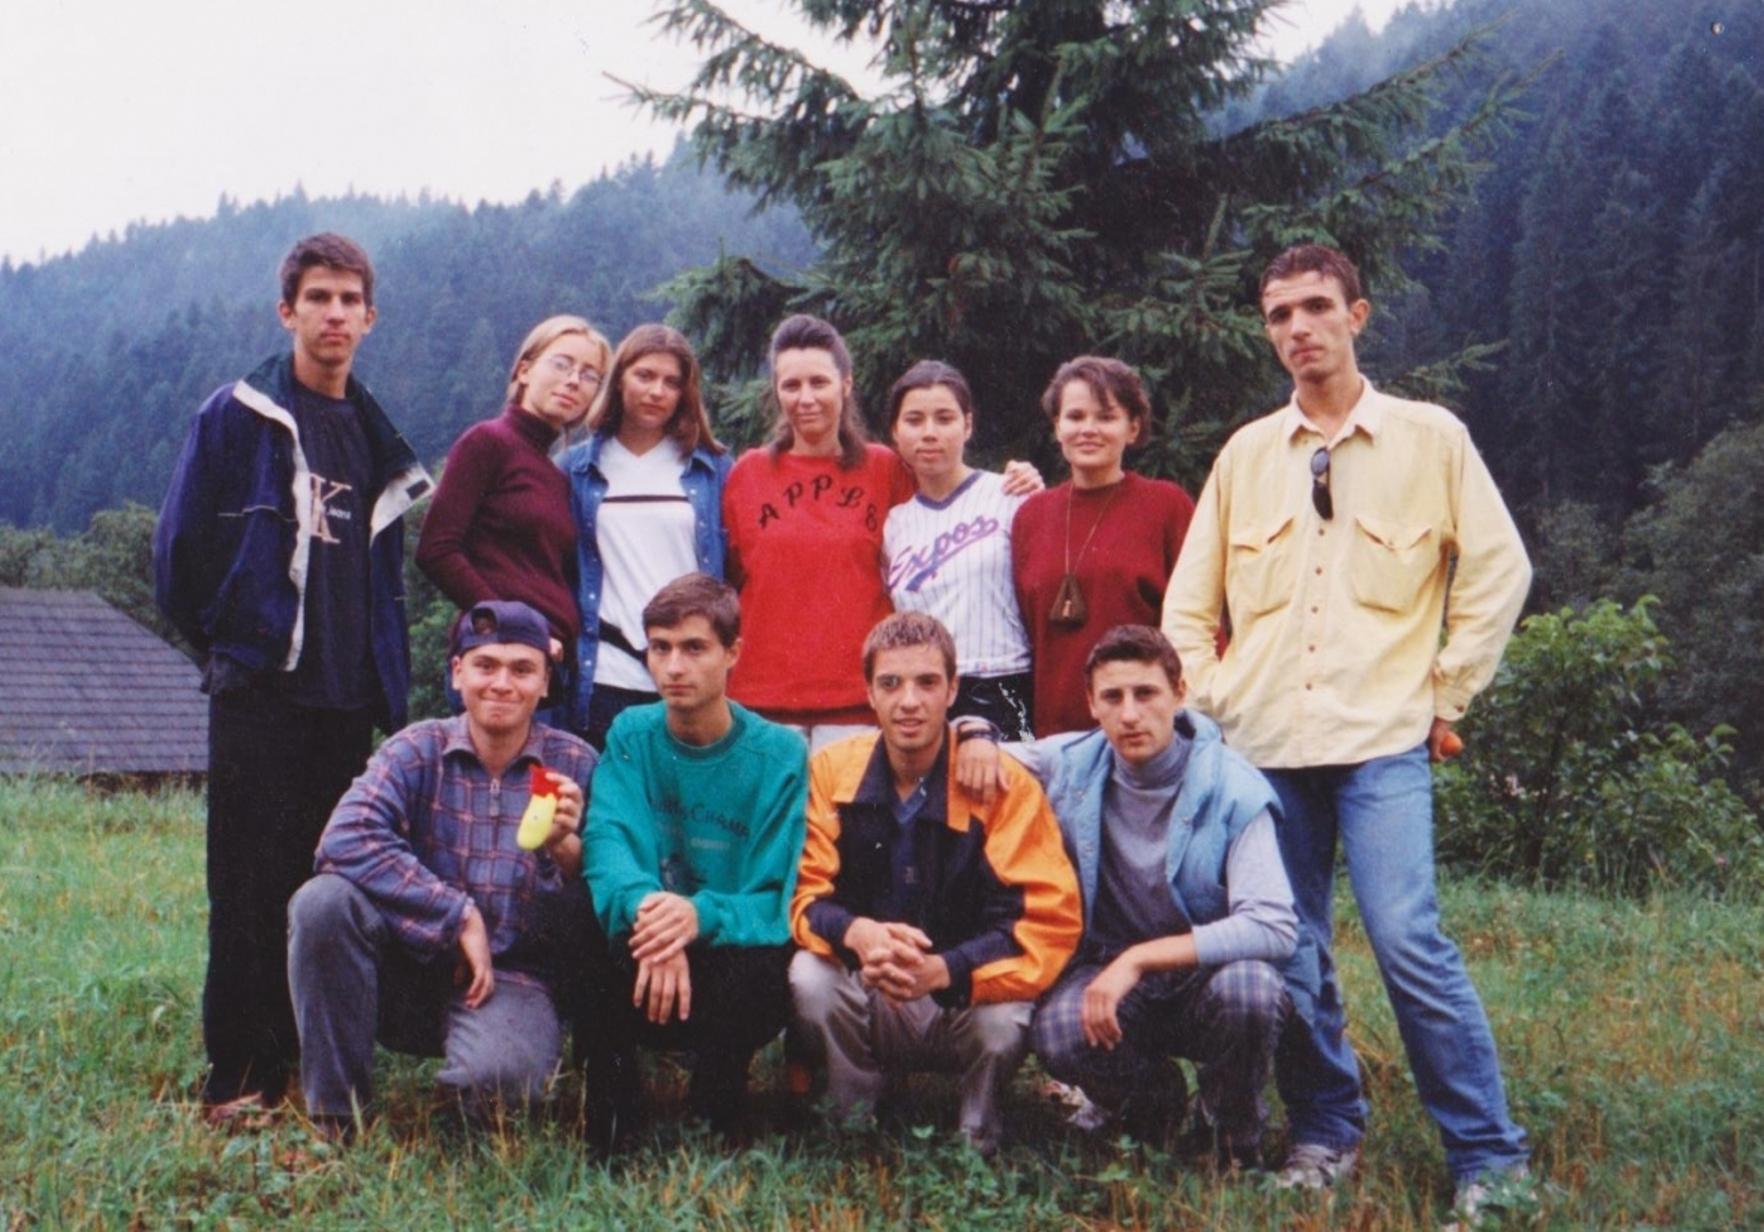 SIMONA CIUCUR CU CATIVA TINERI DIN VECHEA BISERICA CRESTINA DUPA EVANGHELIE DRAGOS VODA LA SUCEVITA IN 1998